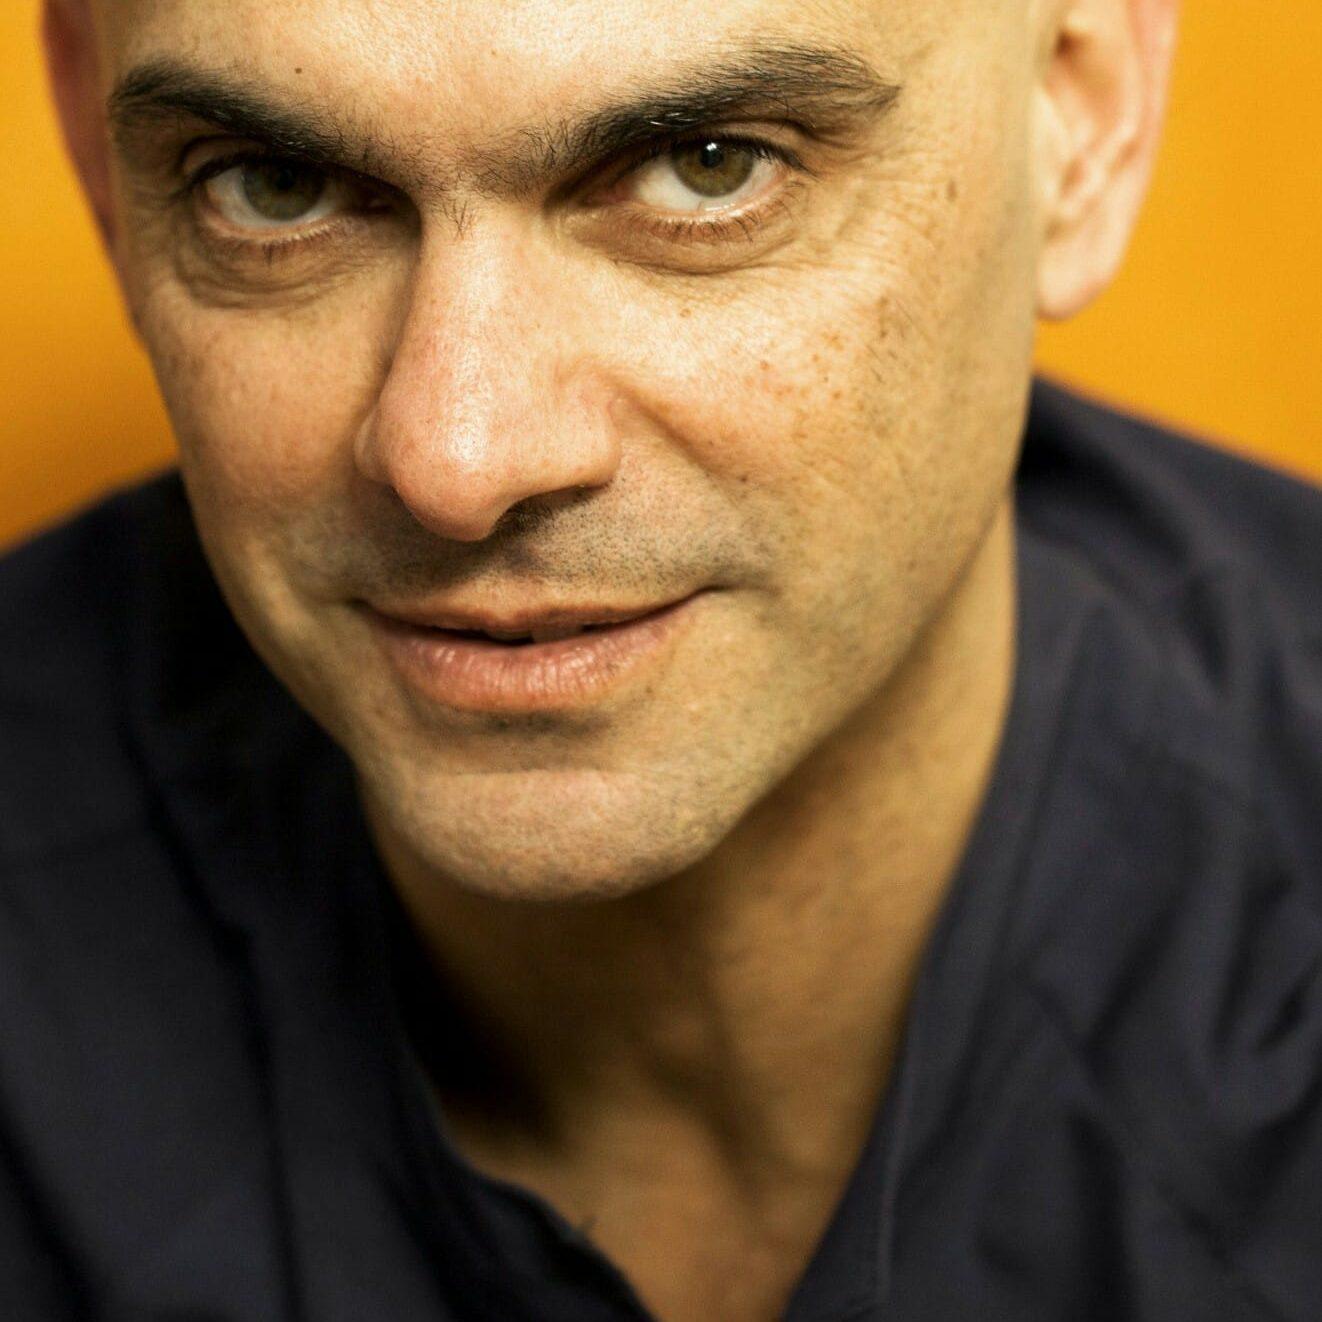 Dr_Federico_Brugnami